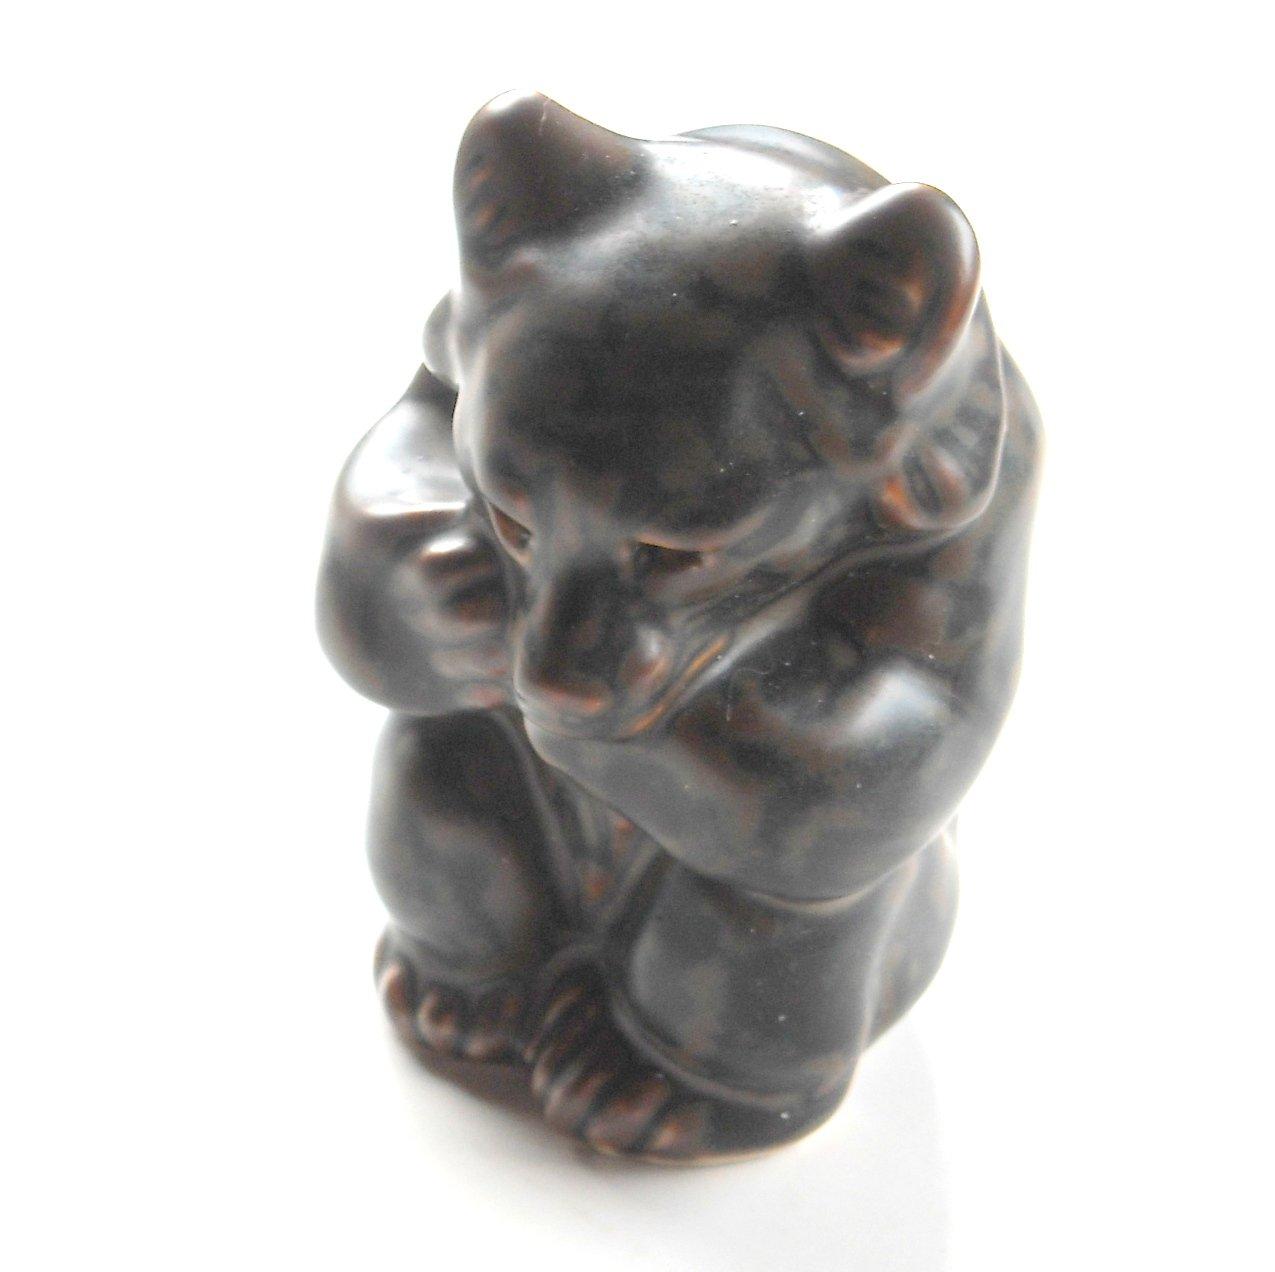 Knud Kyhn Bear Cub Brown Royal Copenhagen Figurine